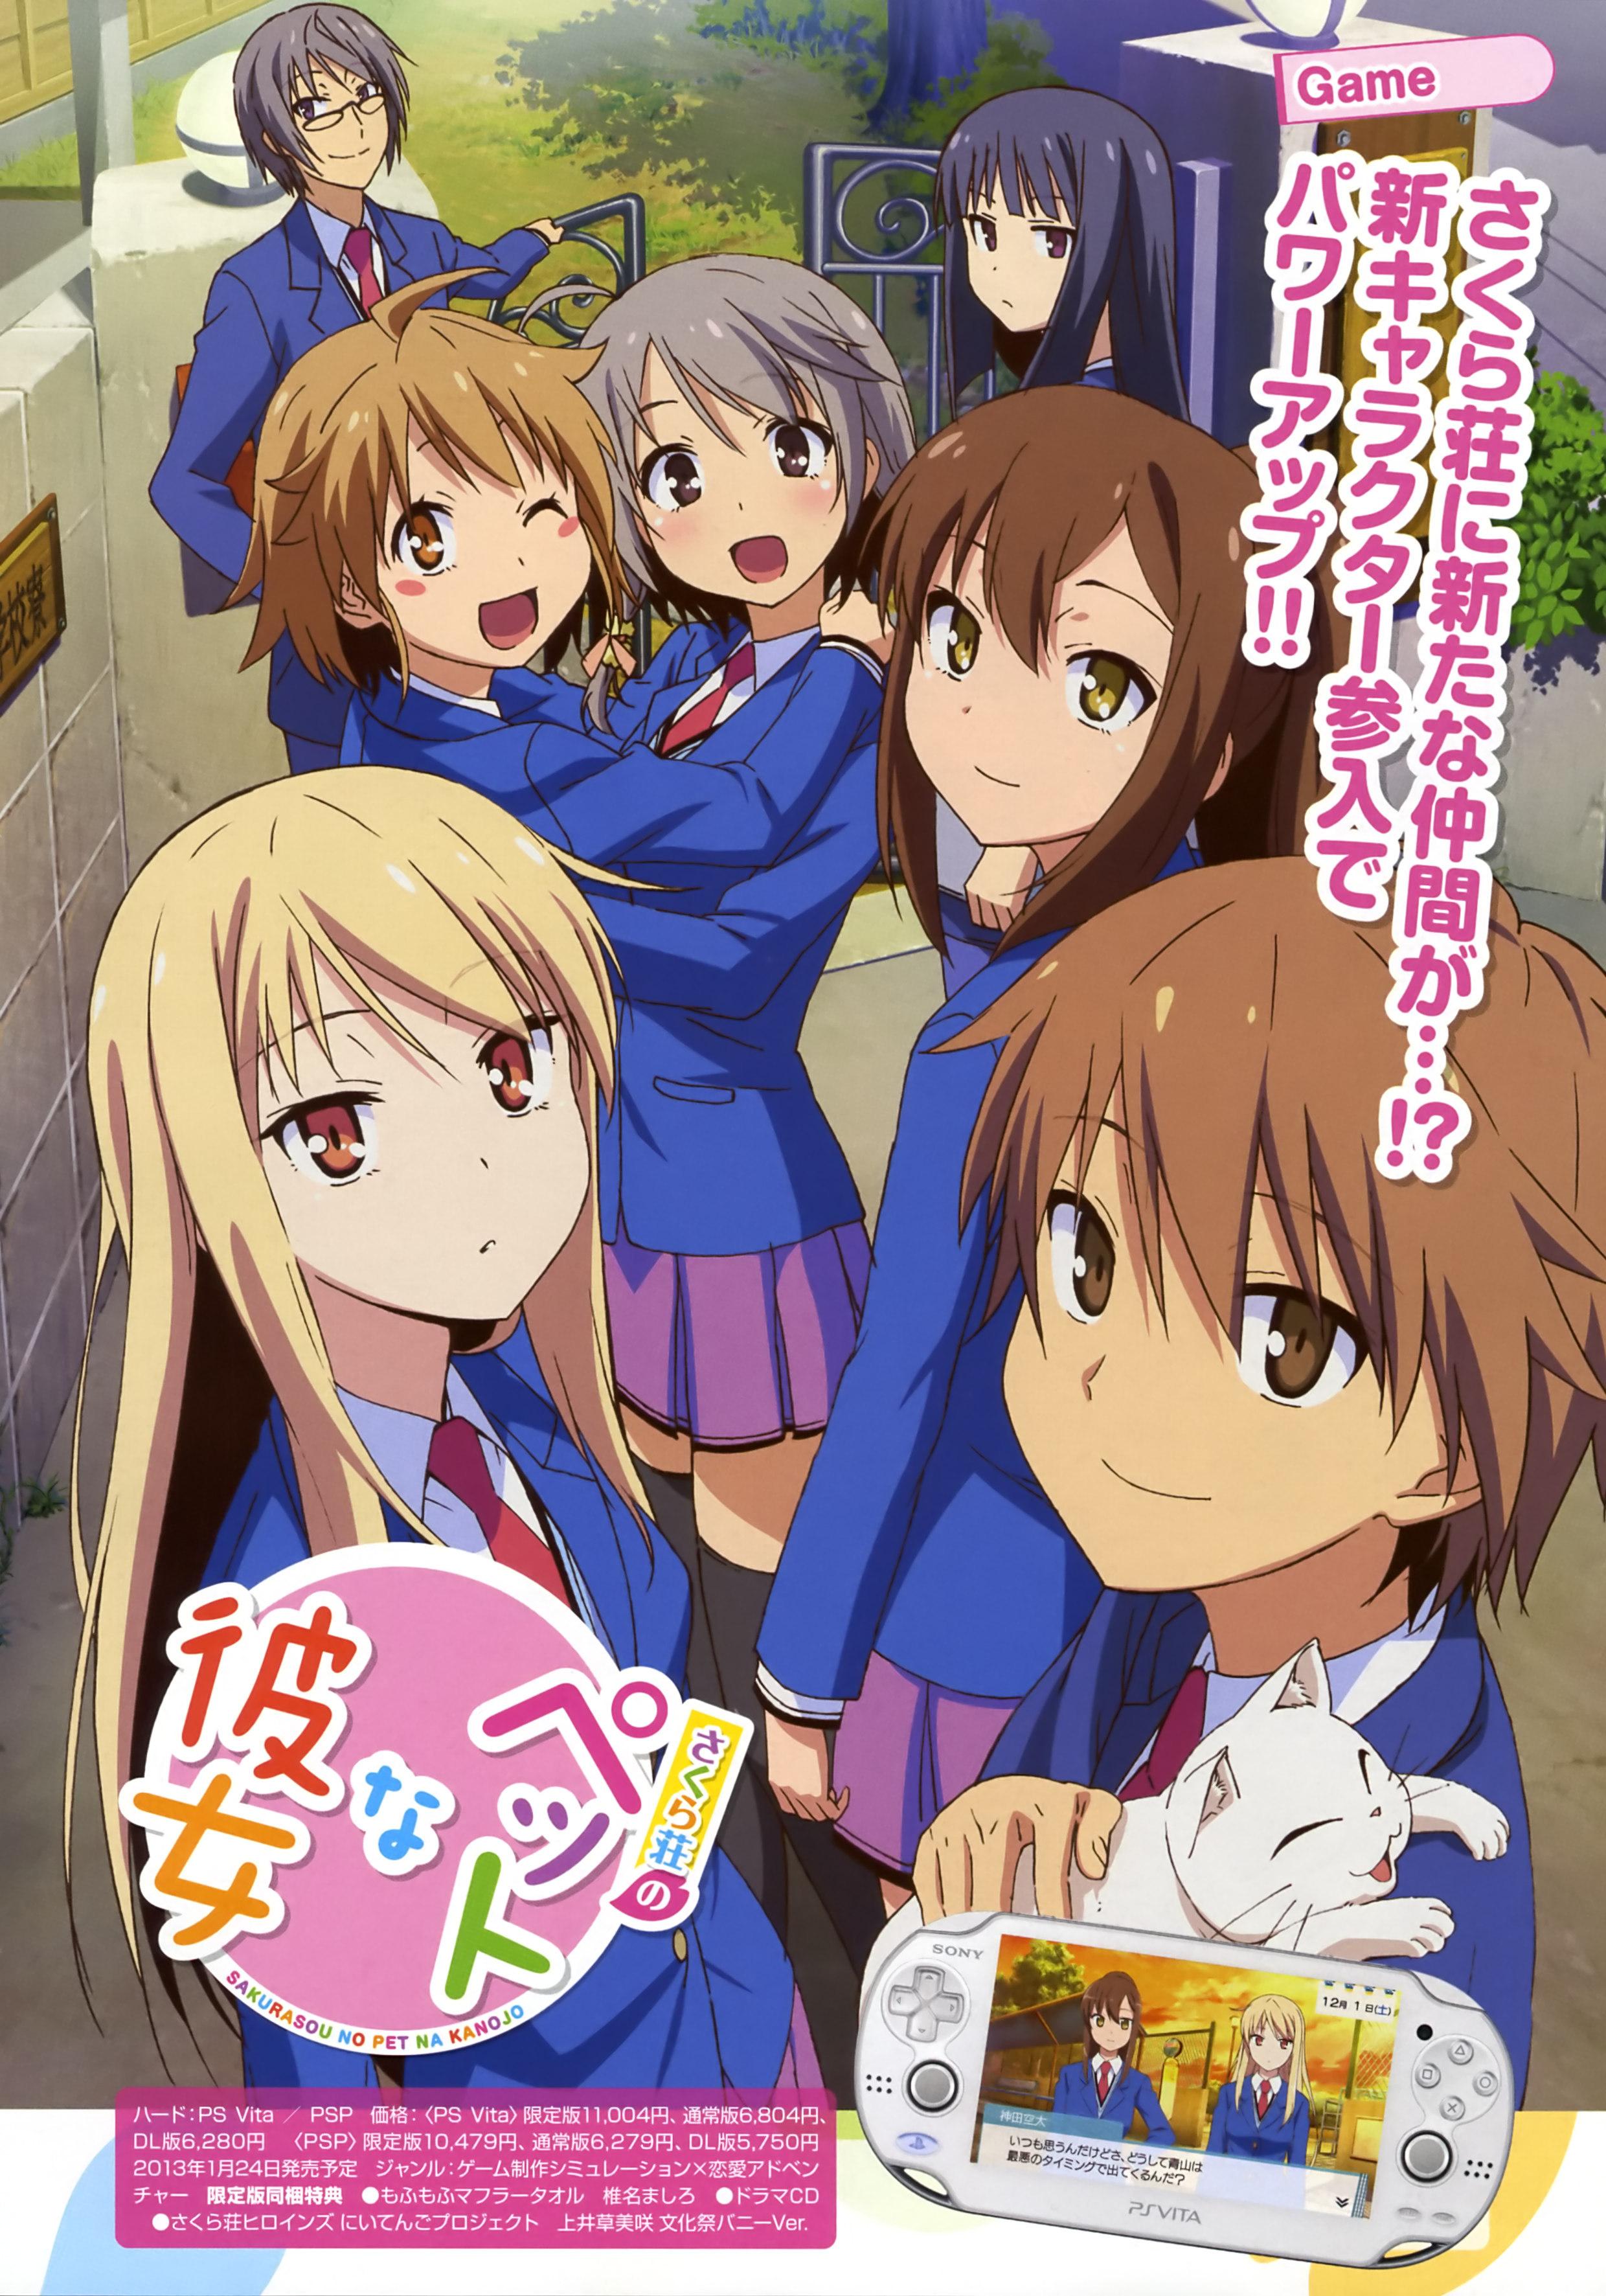 Sakurasou No Pet Na Kanojo Mobile Wallpaper 1300152 Zerochan Anime Image Board